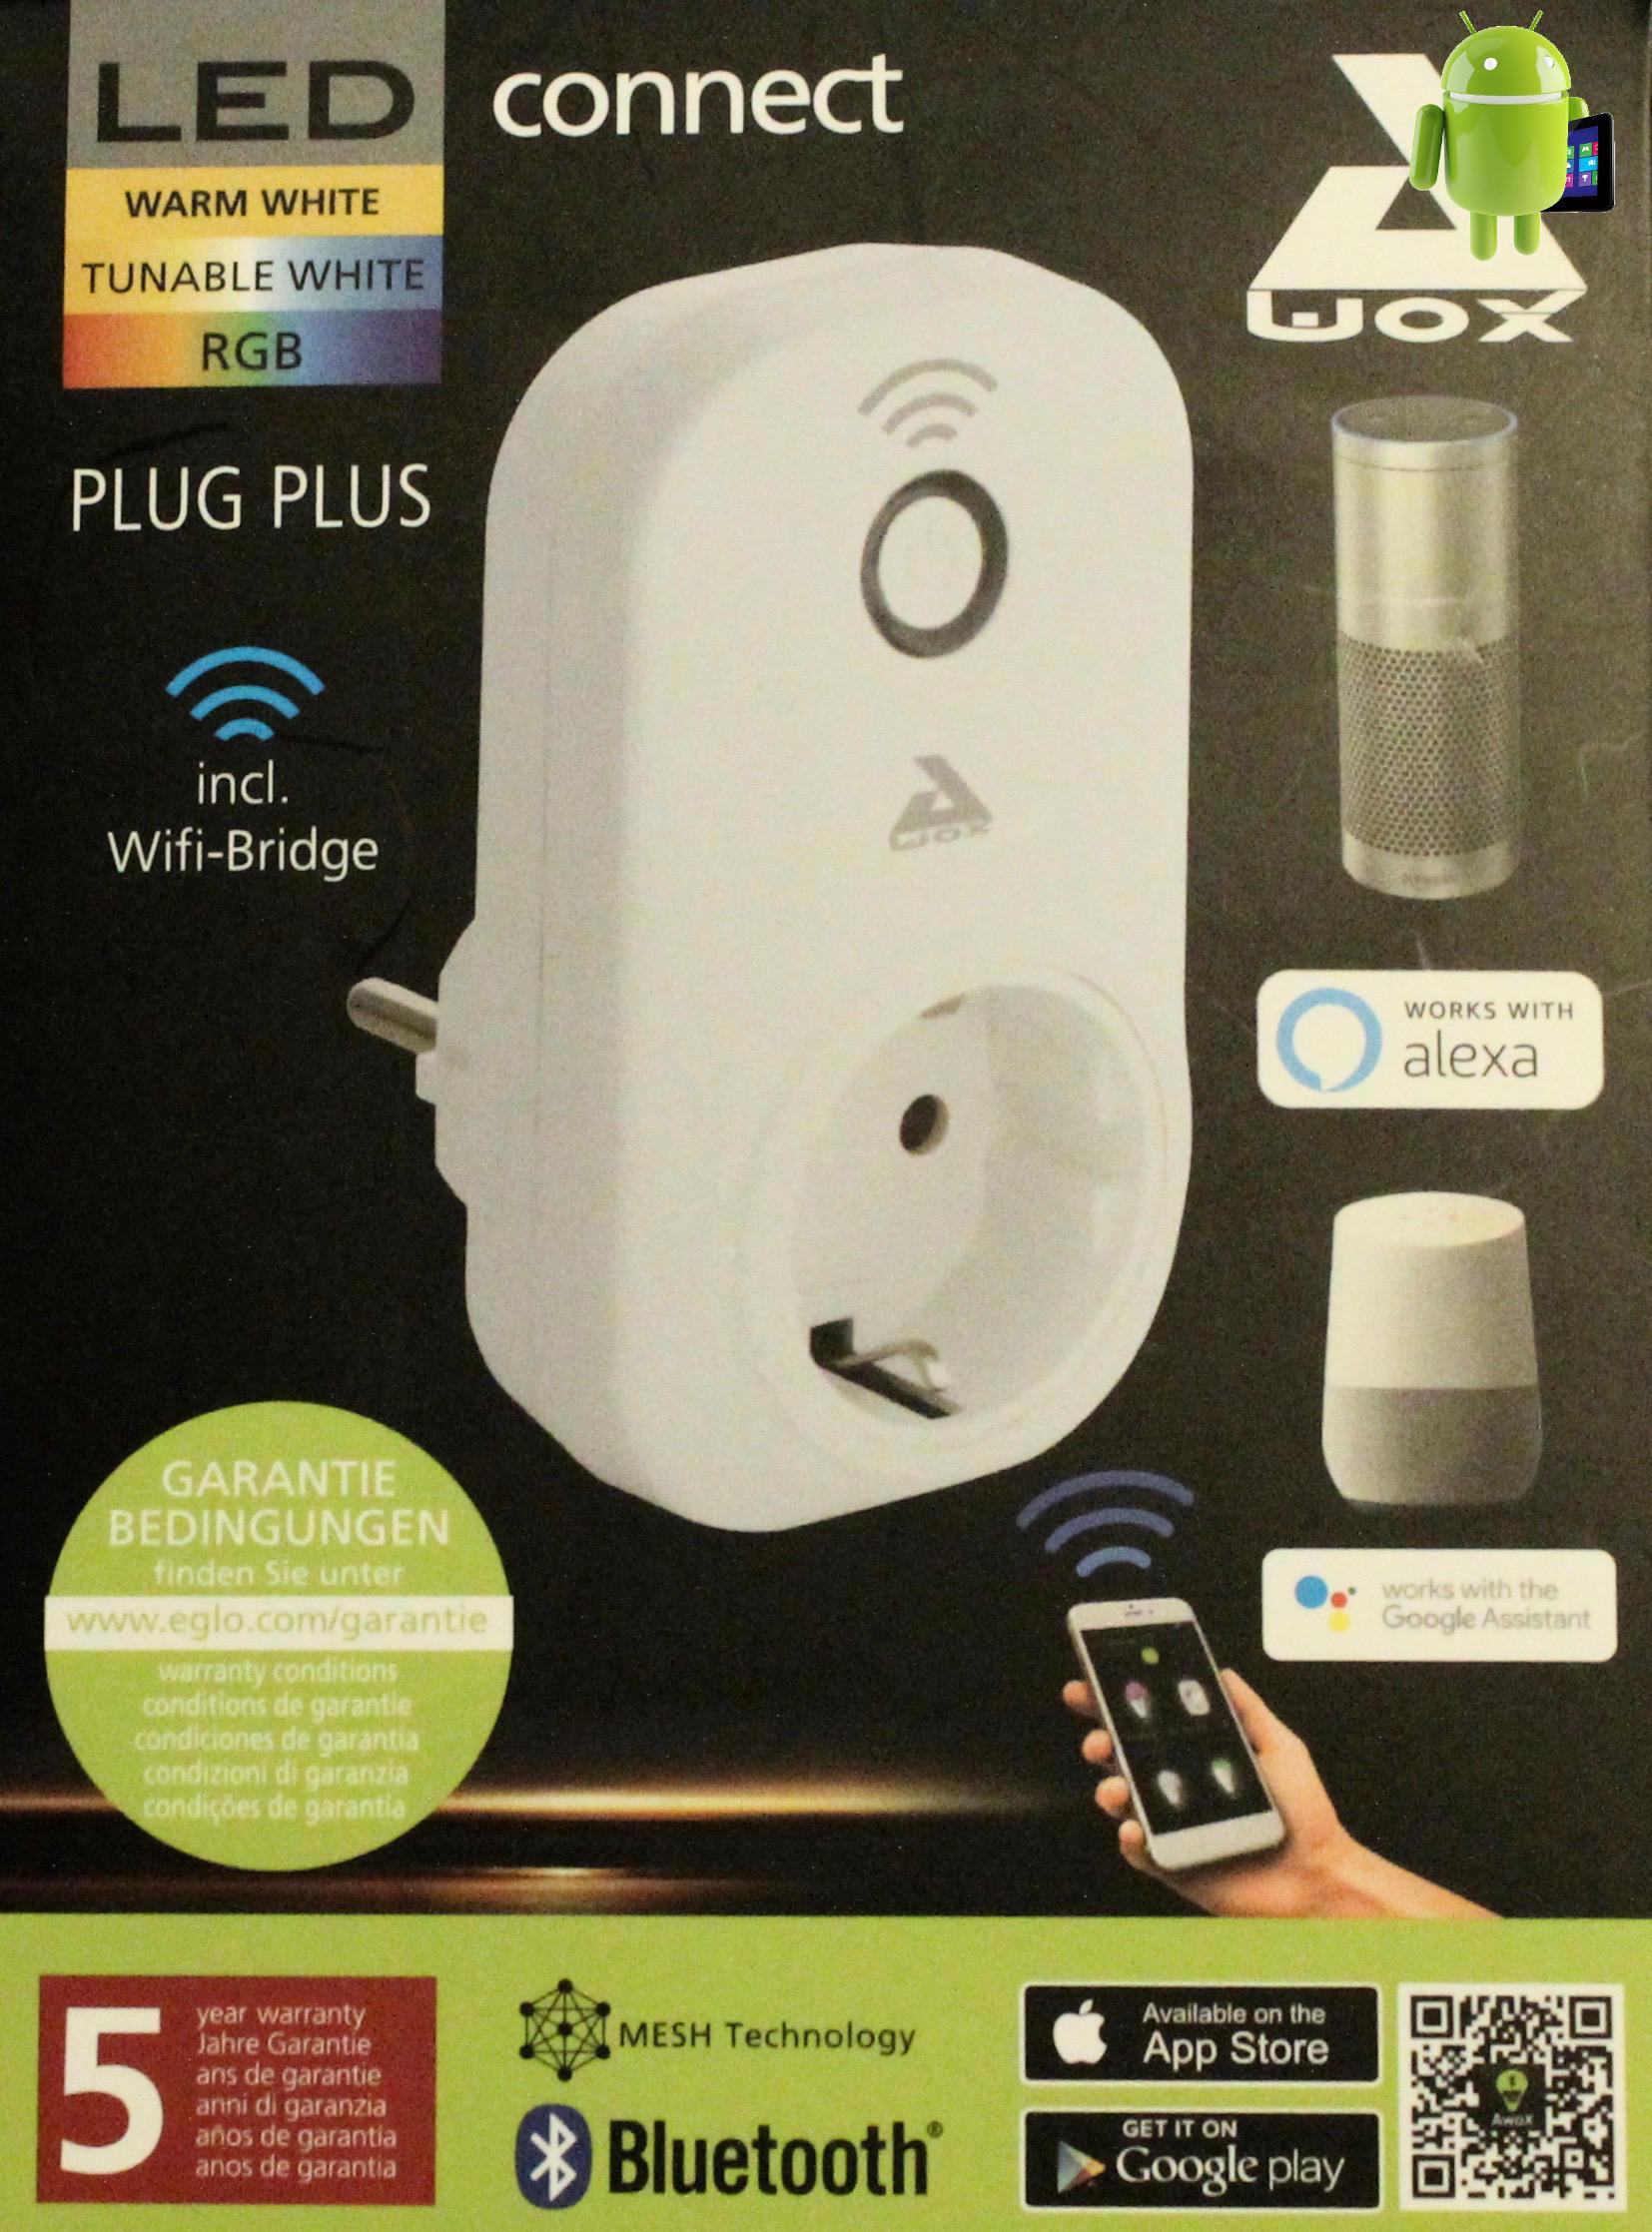 Awox Eglo Connect Plug Plus Awox Eglo Connect Plug Plus